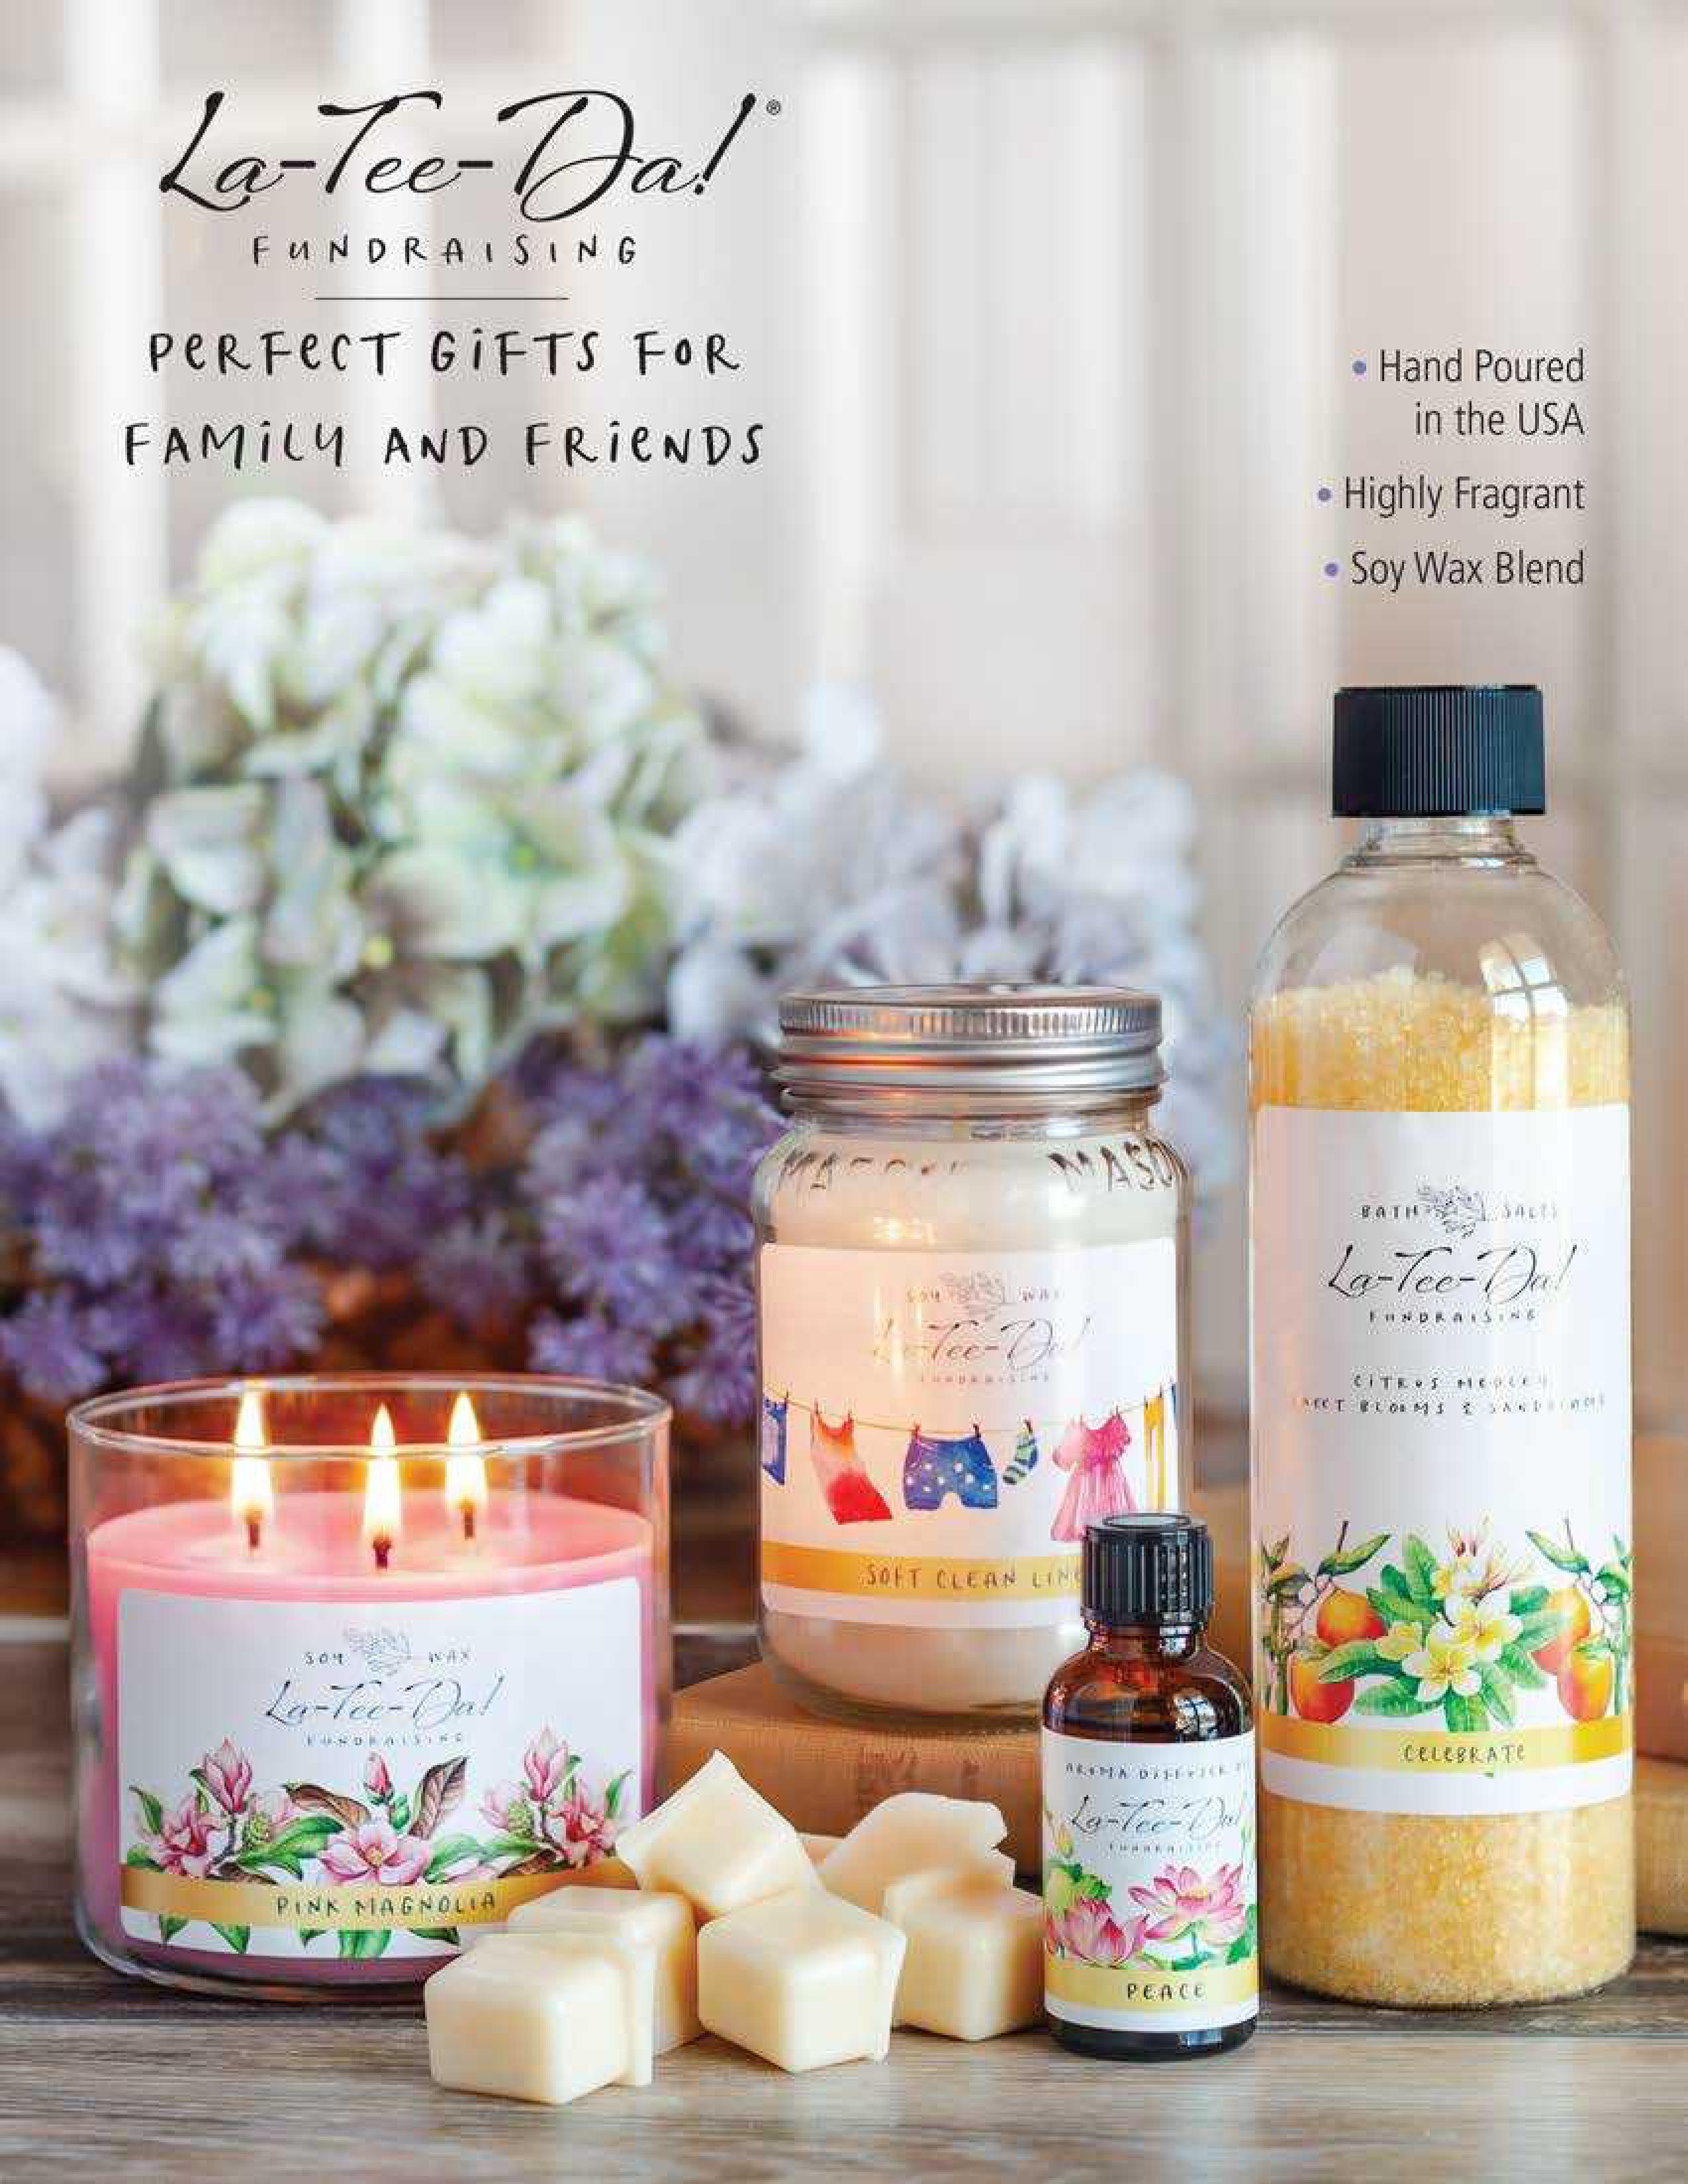 La-Tee-Da! Fundraising Perfect Gifts